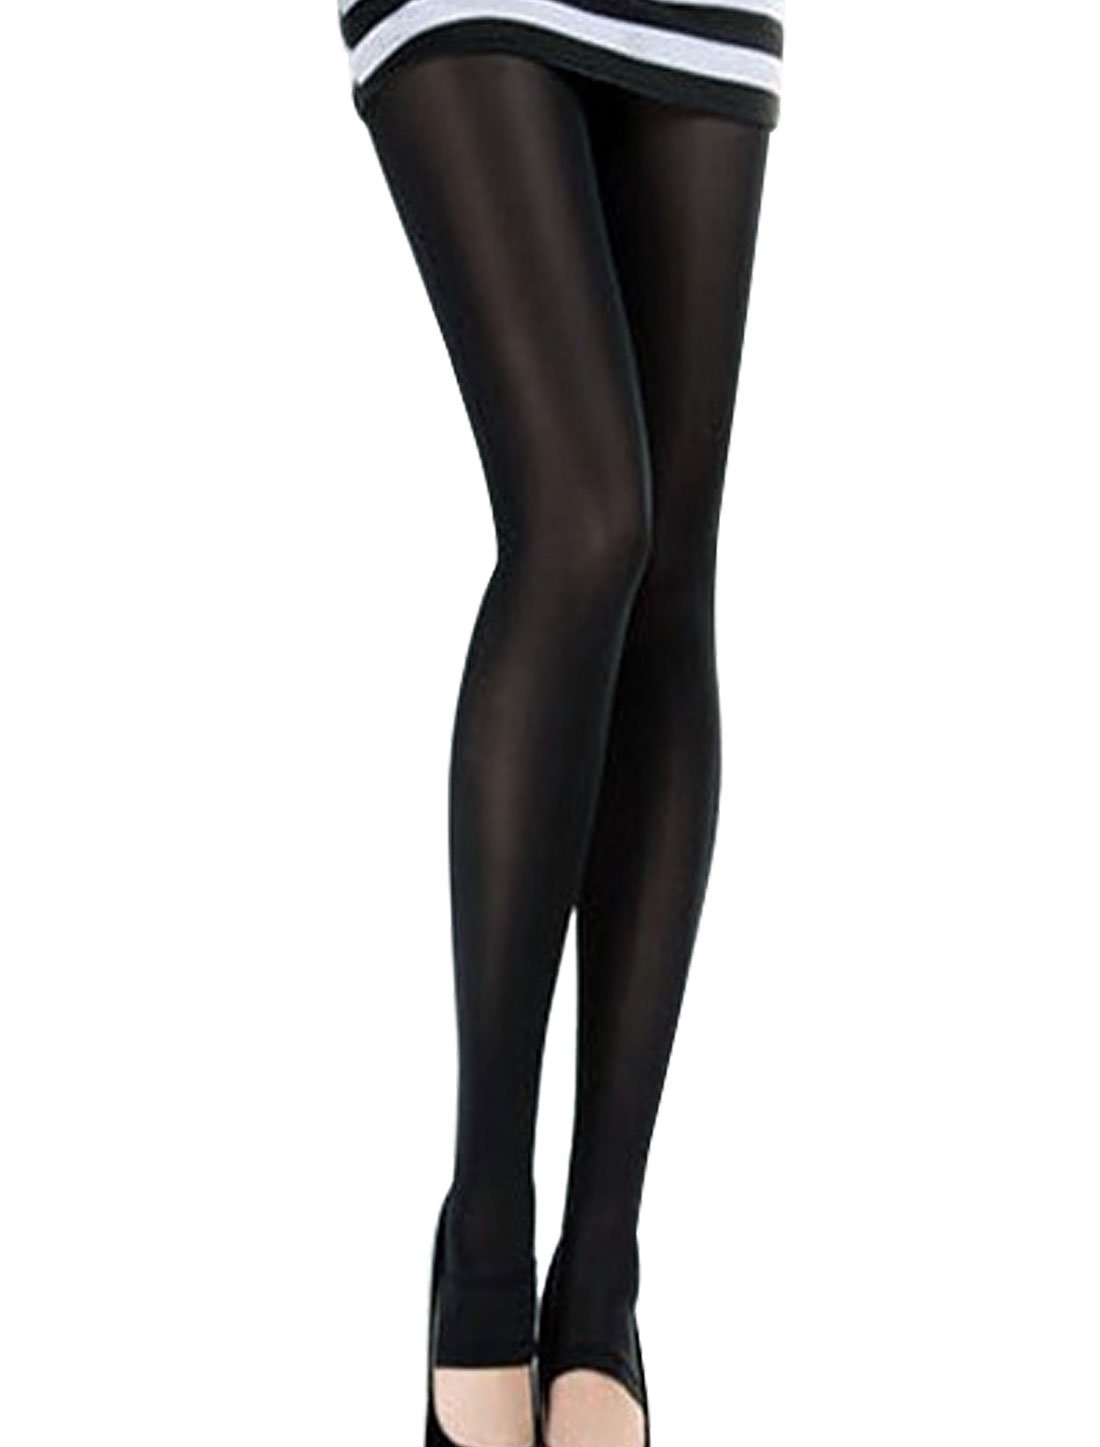 Woman Elastic Textured Skinny Skintight Pantyhose Leggings Black XS